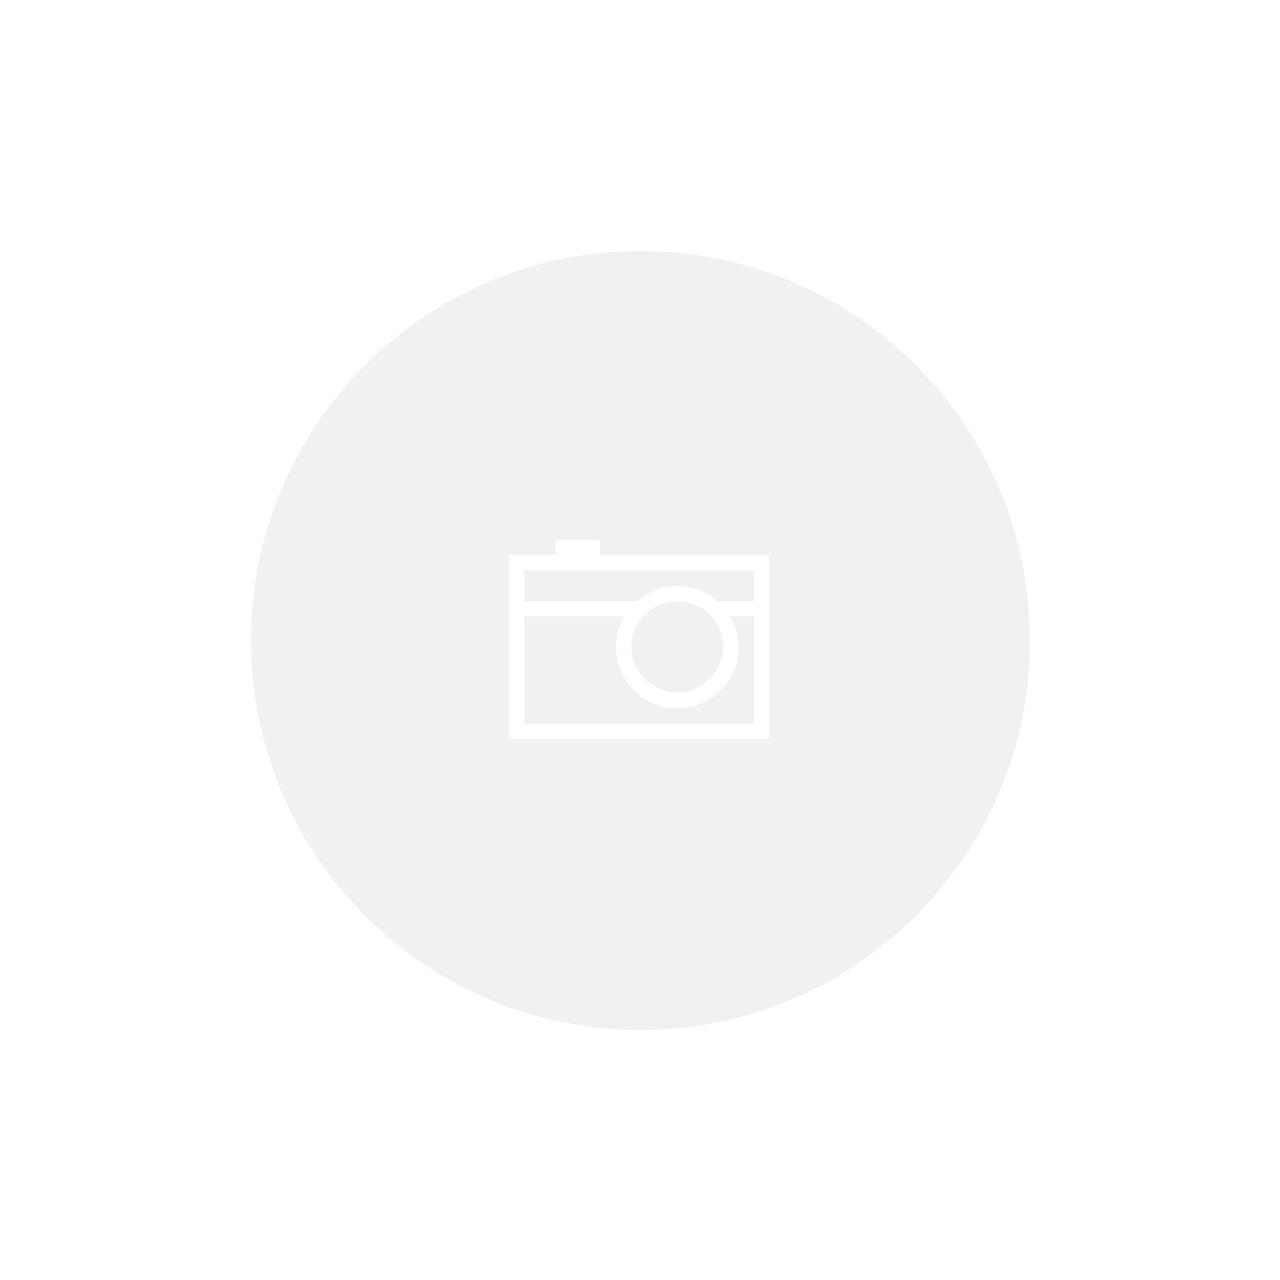 Garfo de Mesa Aço Inox Classic Tramontina